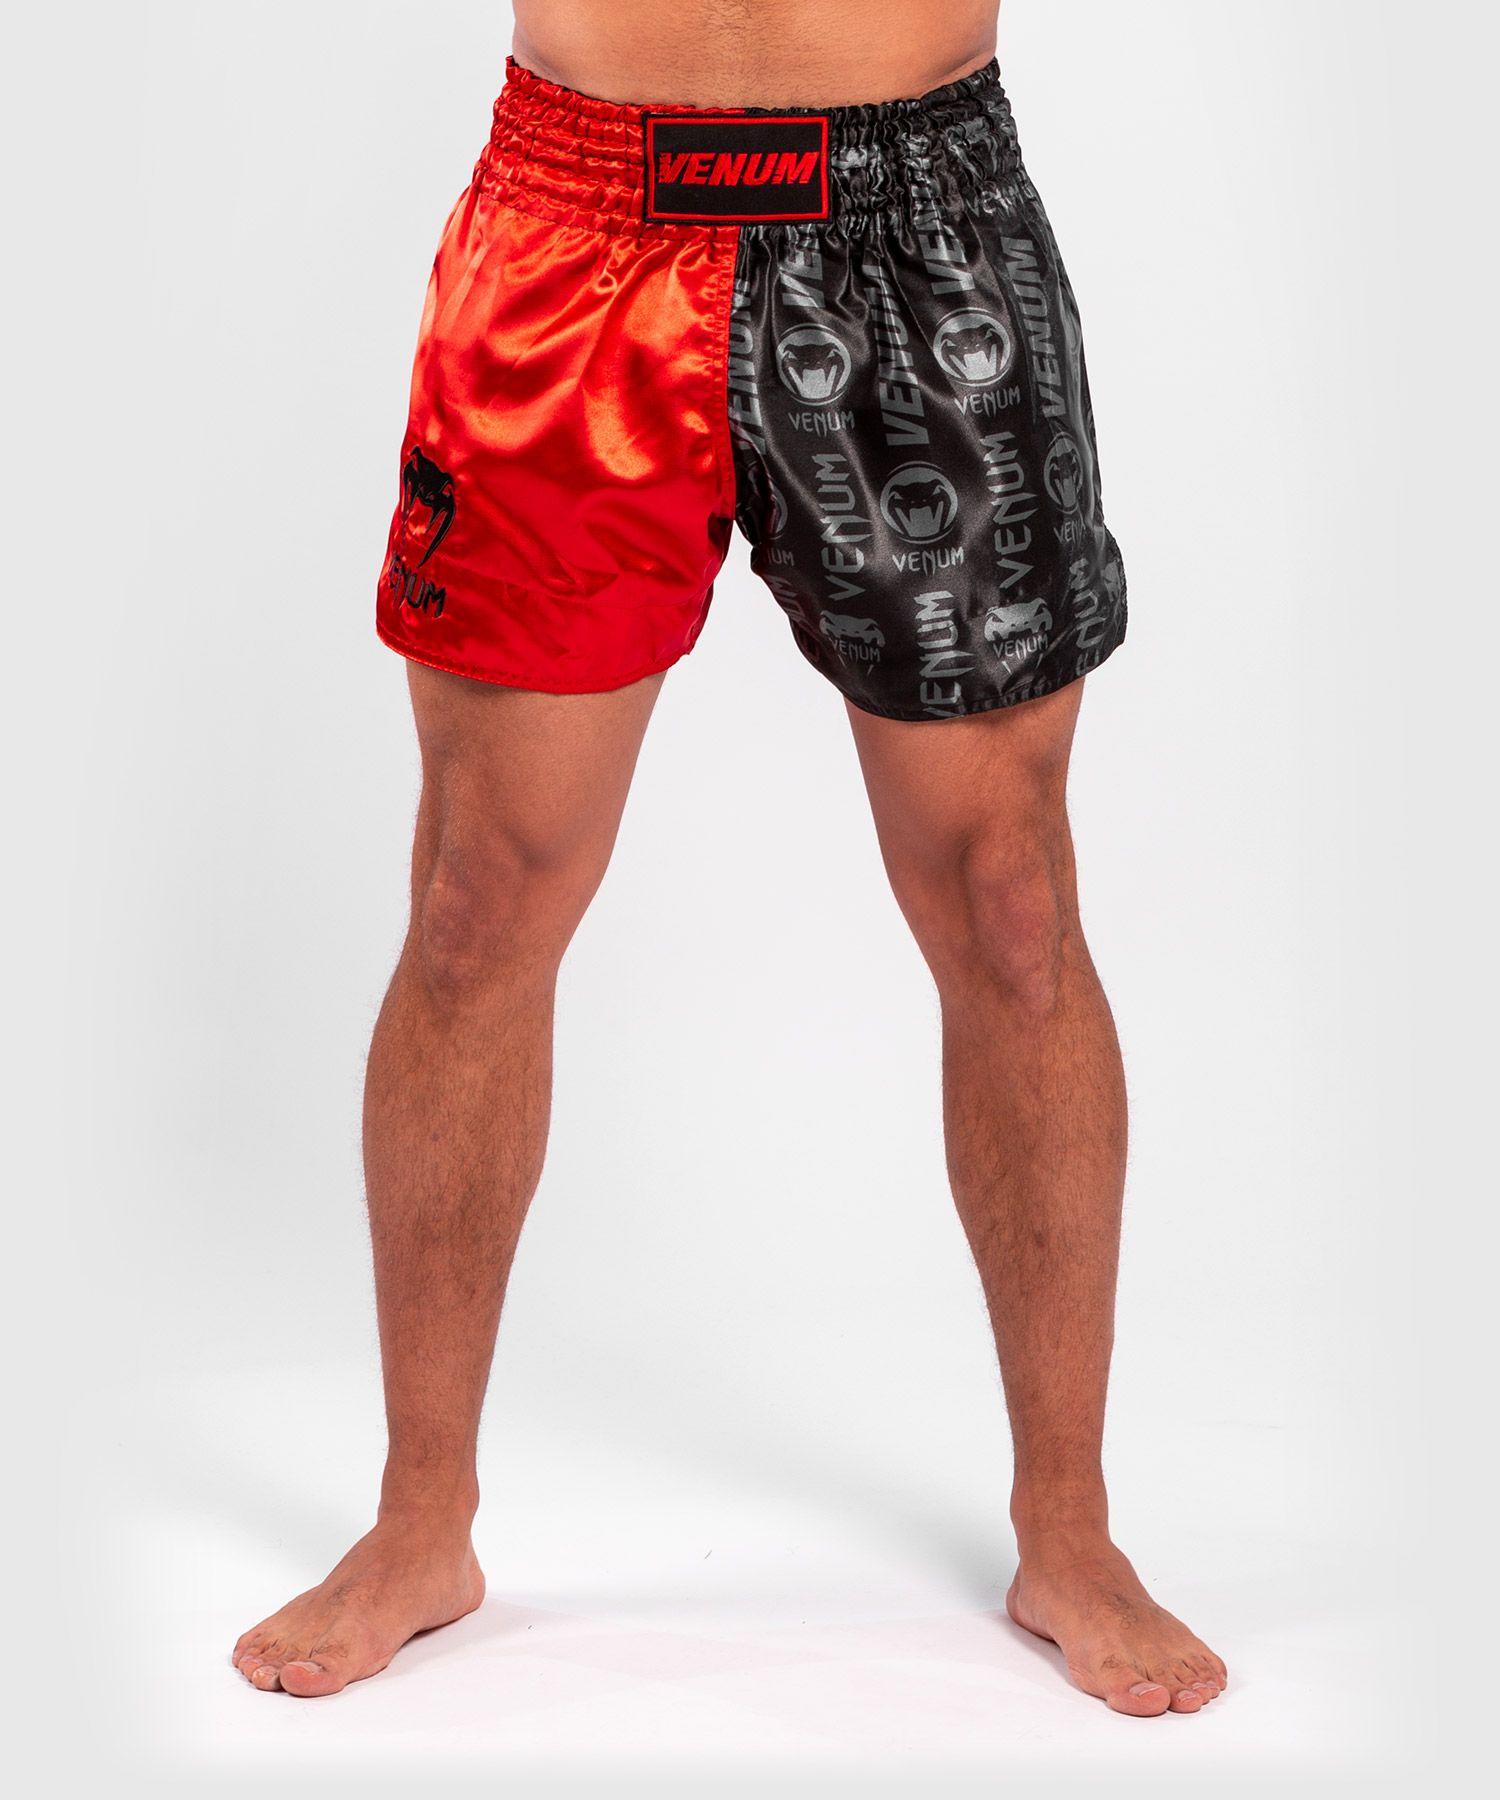 Pantaloncini da Muay Thai Venum Logos - Nero / Rosso